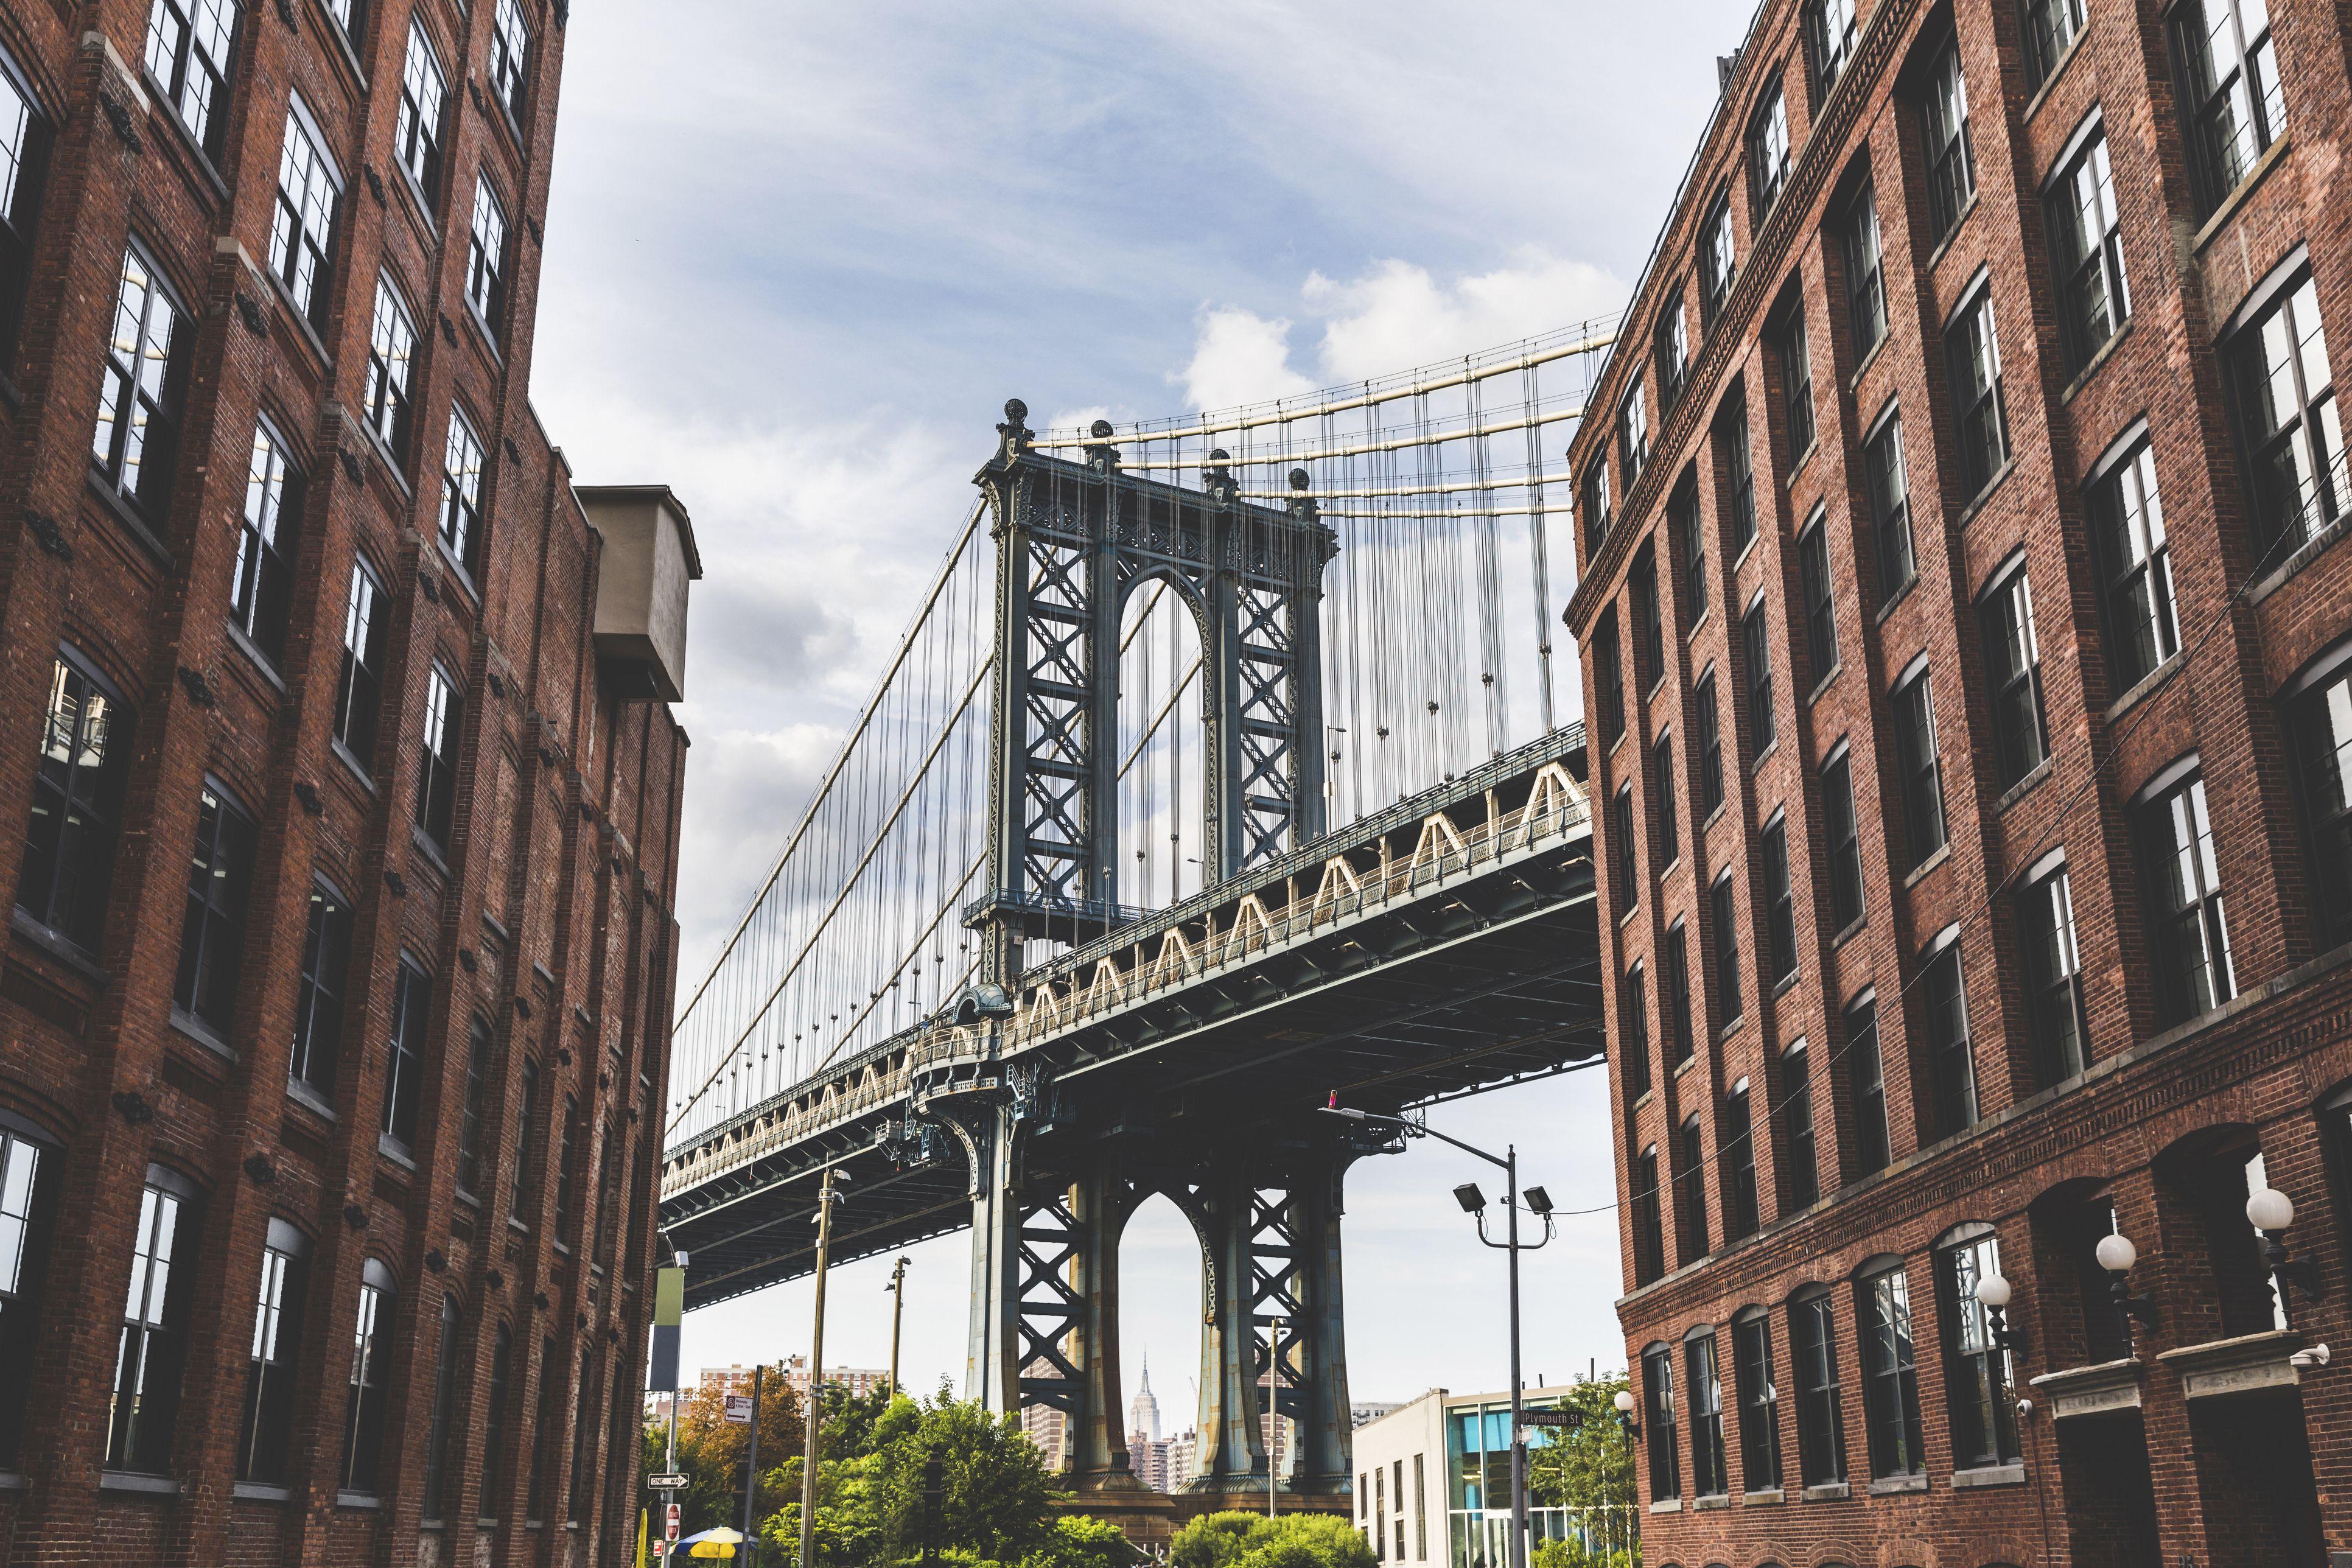 Cheapest Auto Insurance >> Brooklyn to LaGuardia by Public Transportation